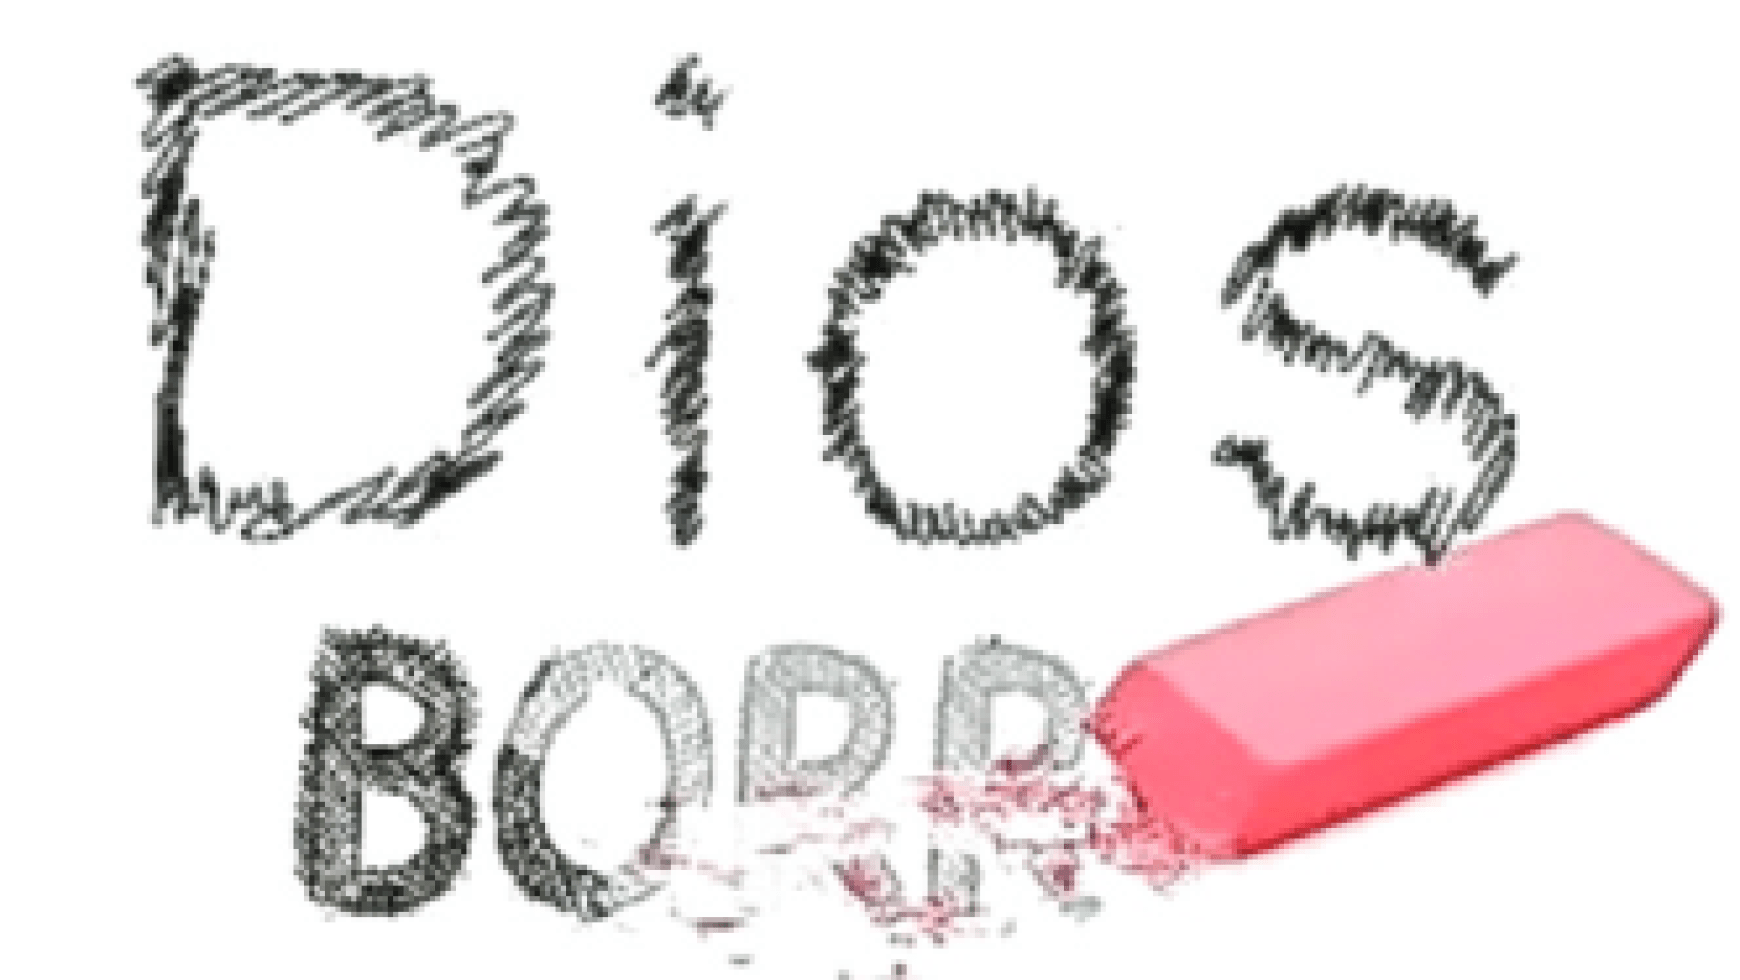 Boletin: Del alma viviente a espiritu vivificante (06/04/2014)